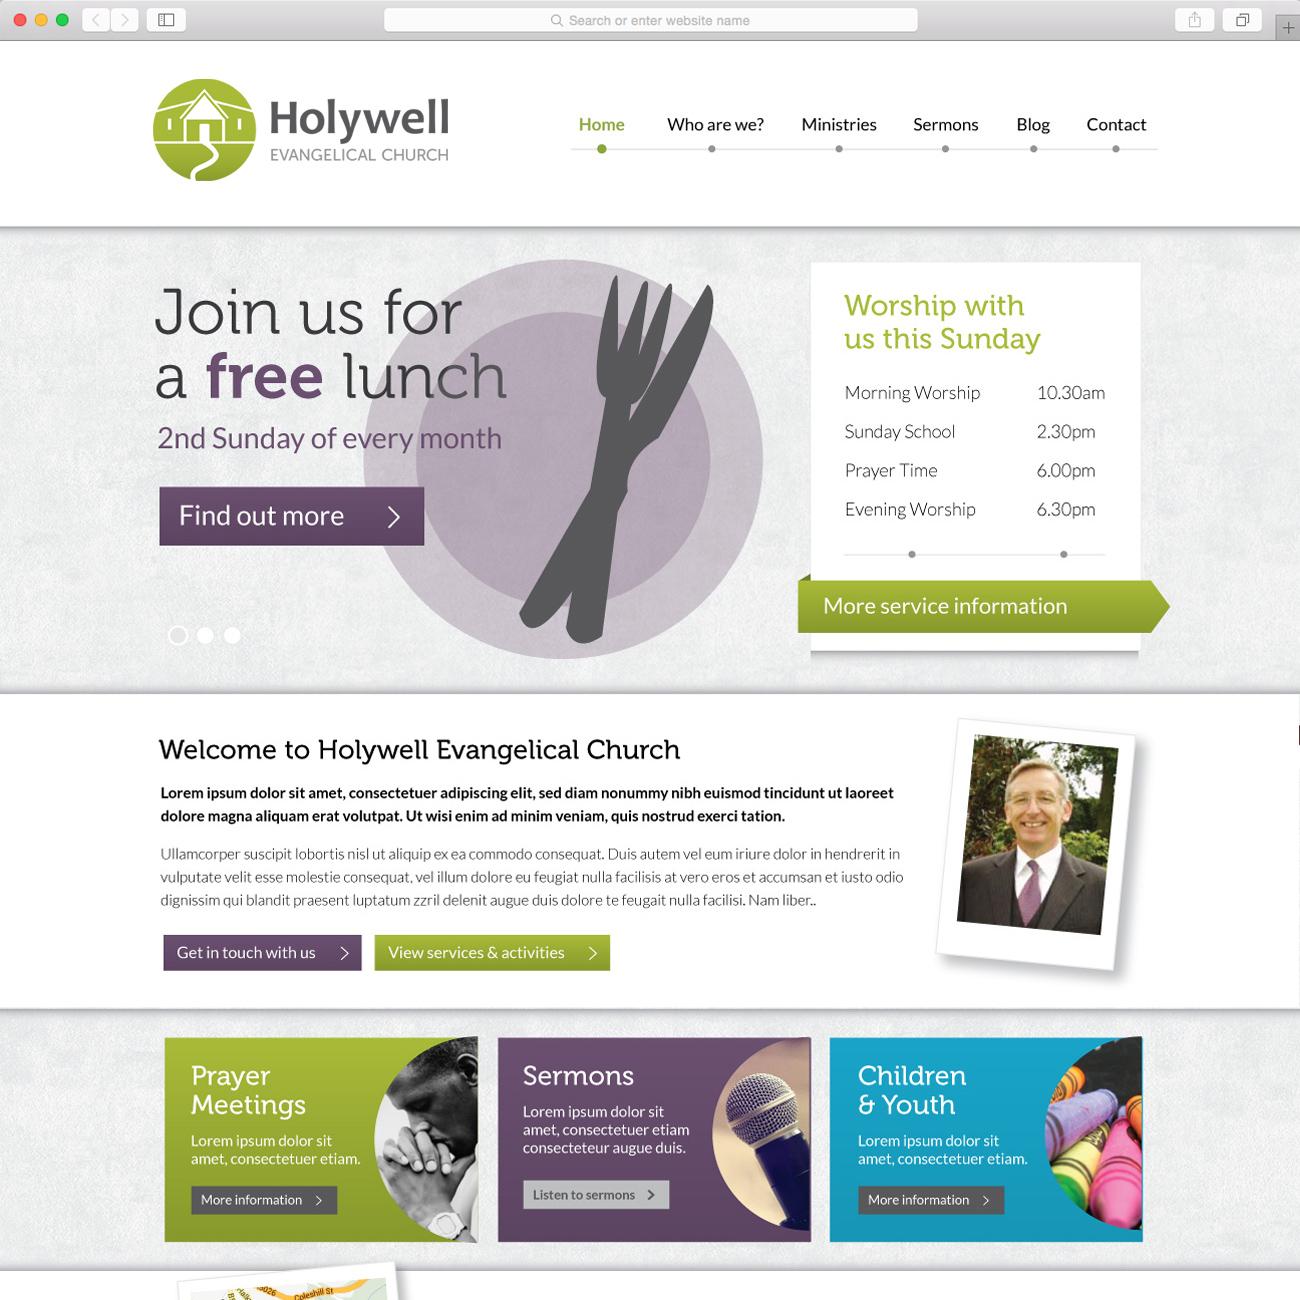 Holywell Evangelical Church